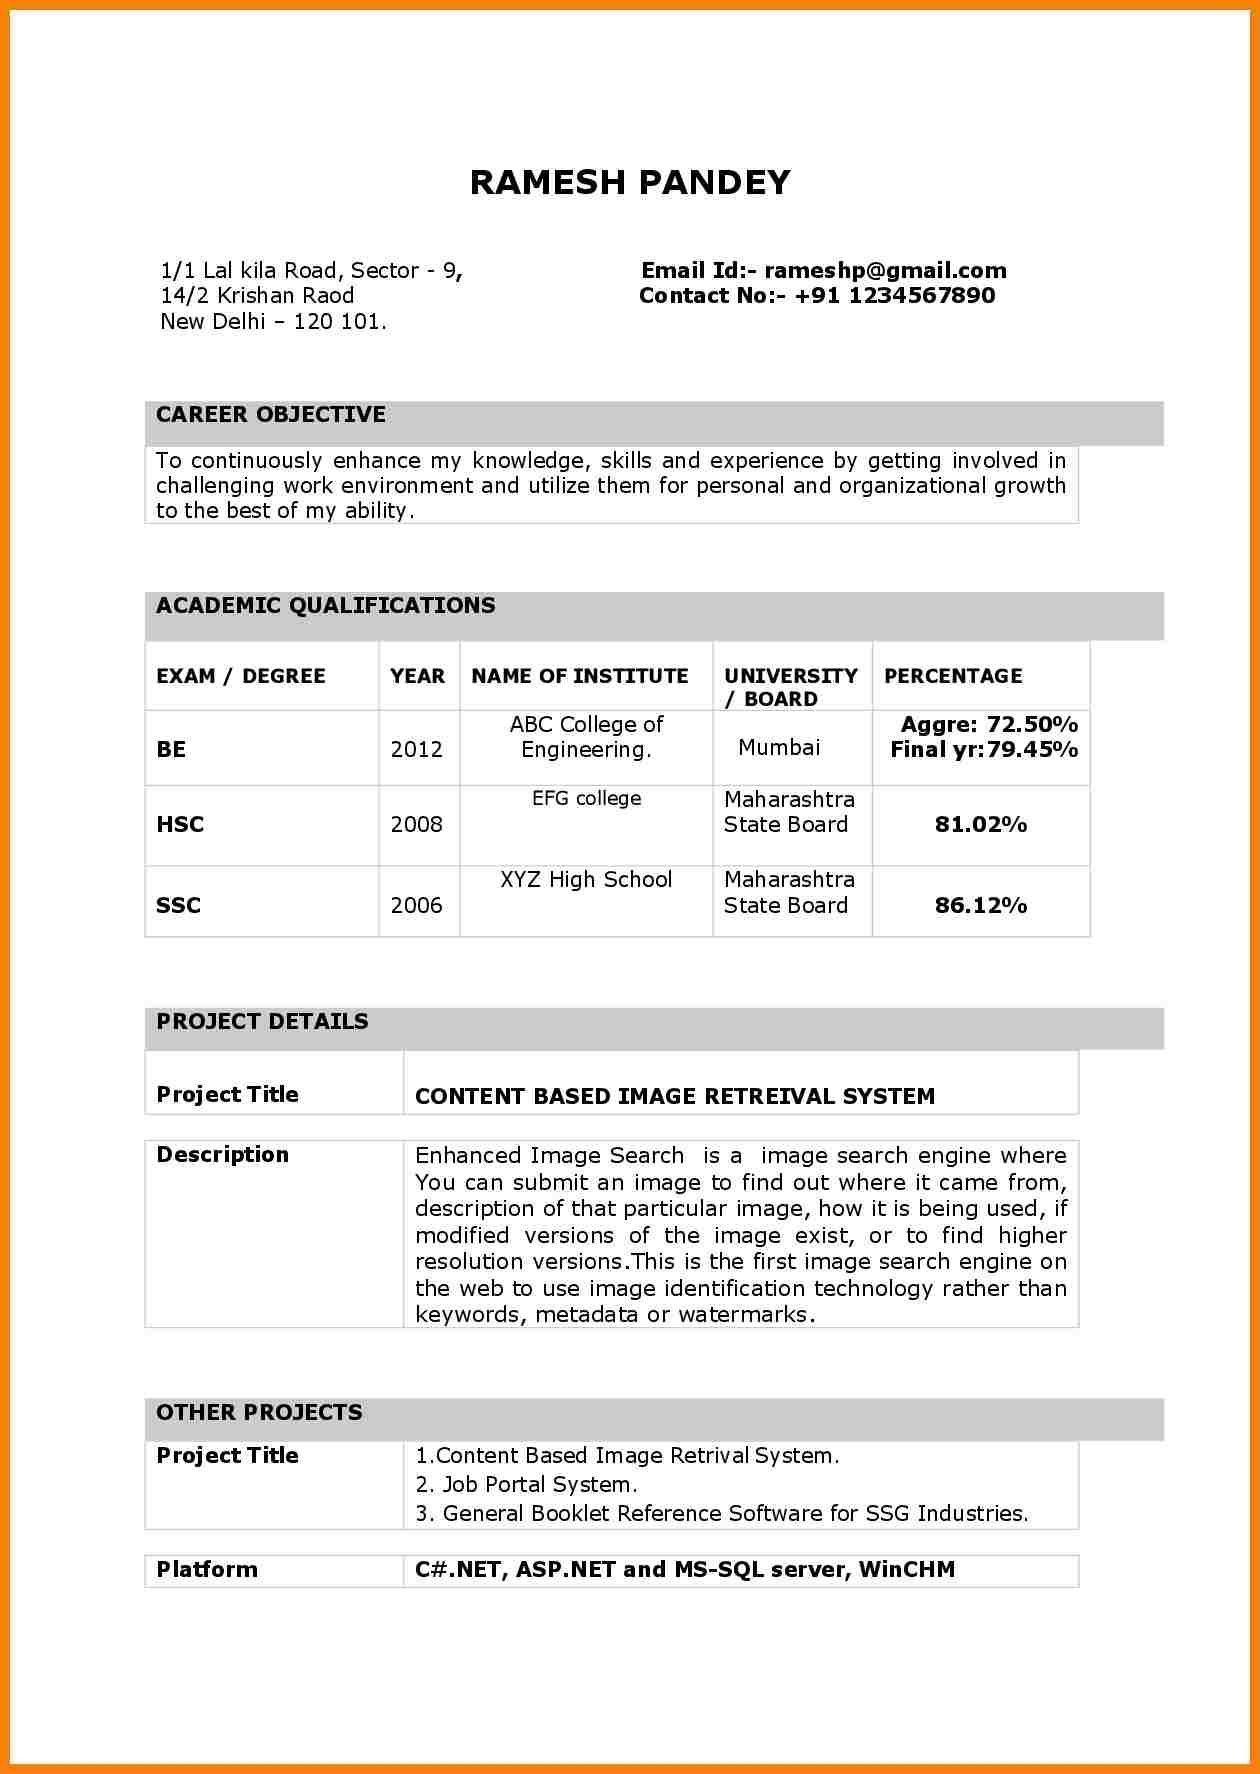 Biodata Format In Word Free Download Google Search Resume Format In Word Teacher Resume Teacher Resume Template Free